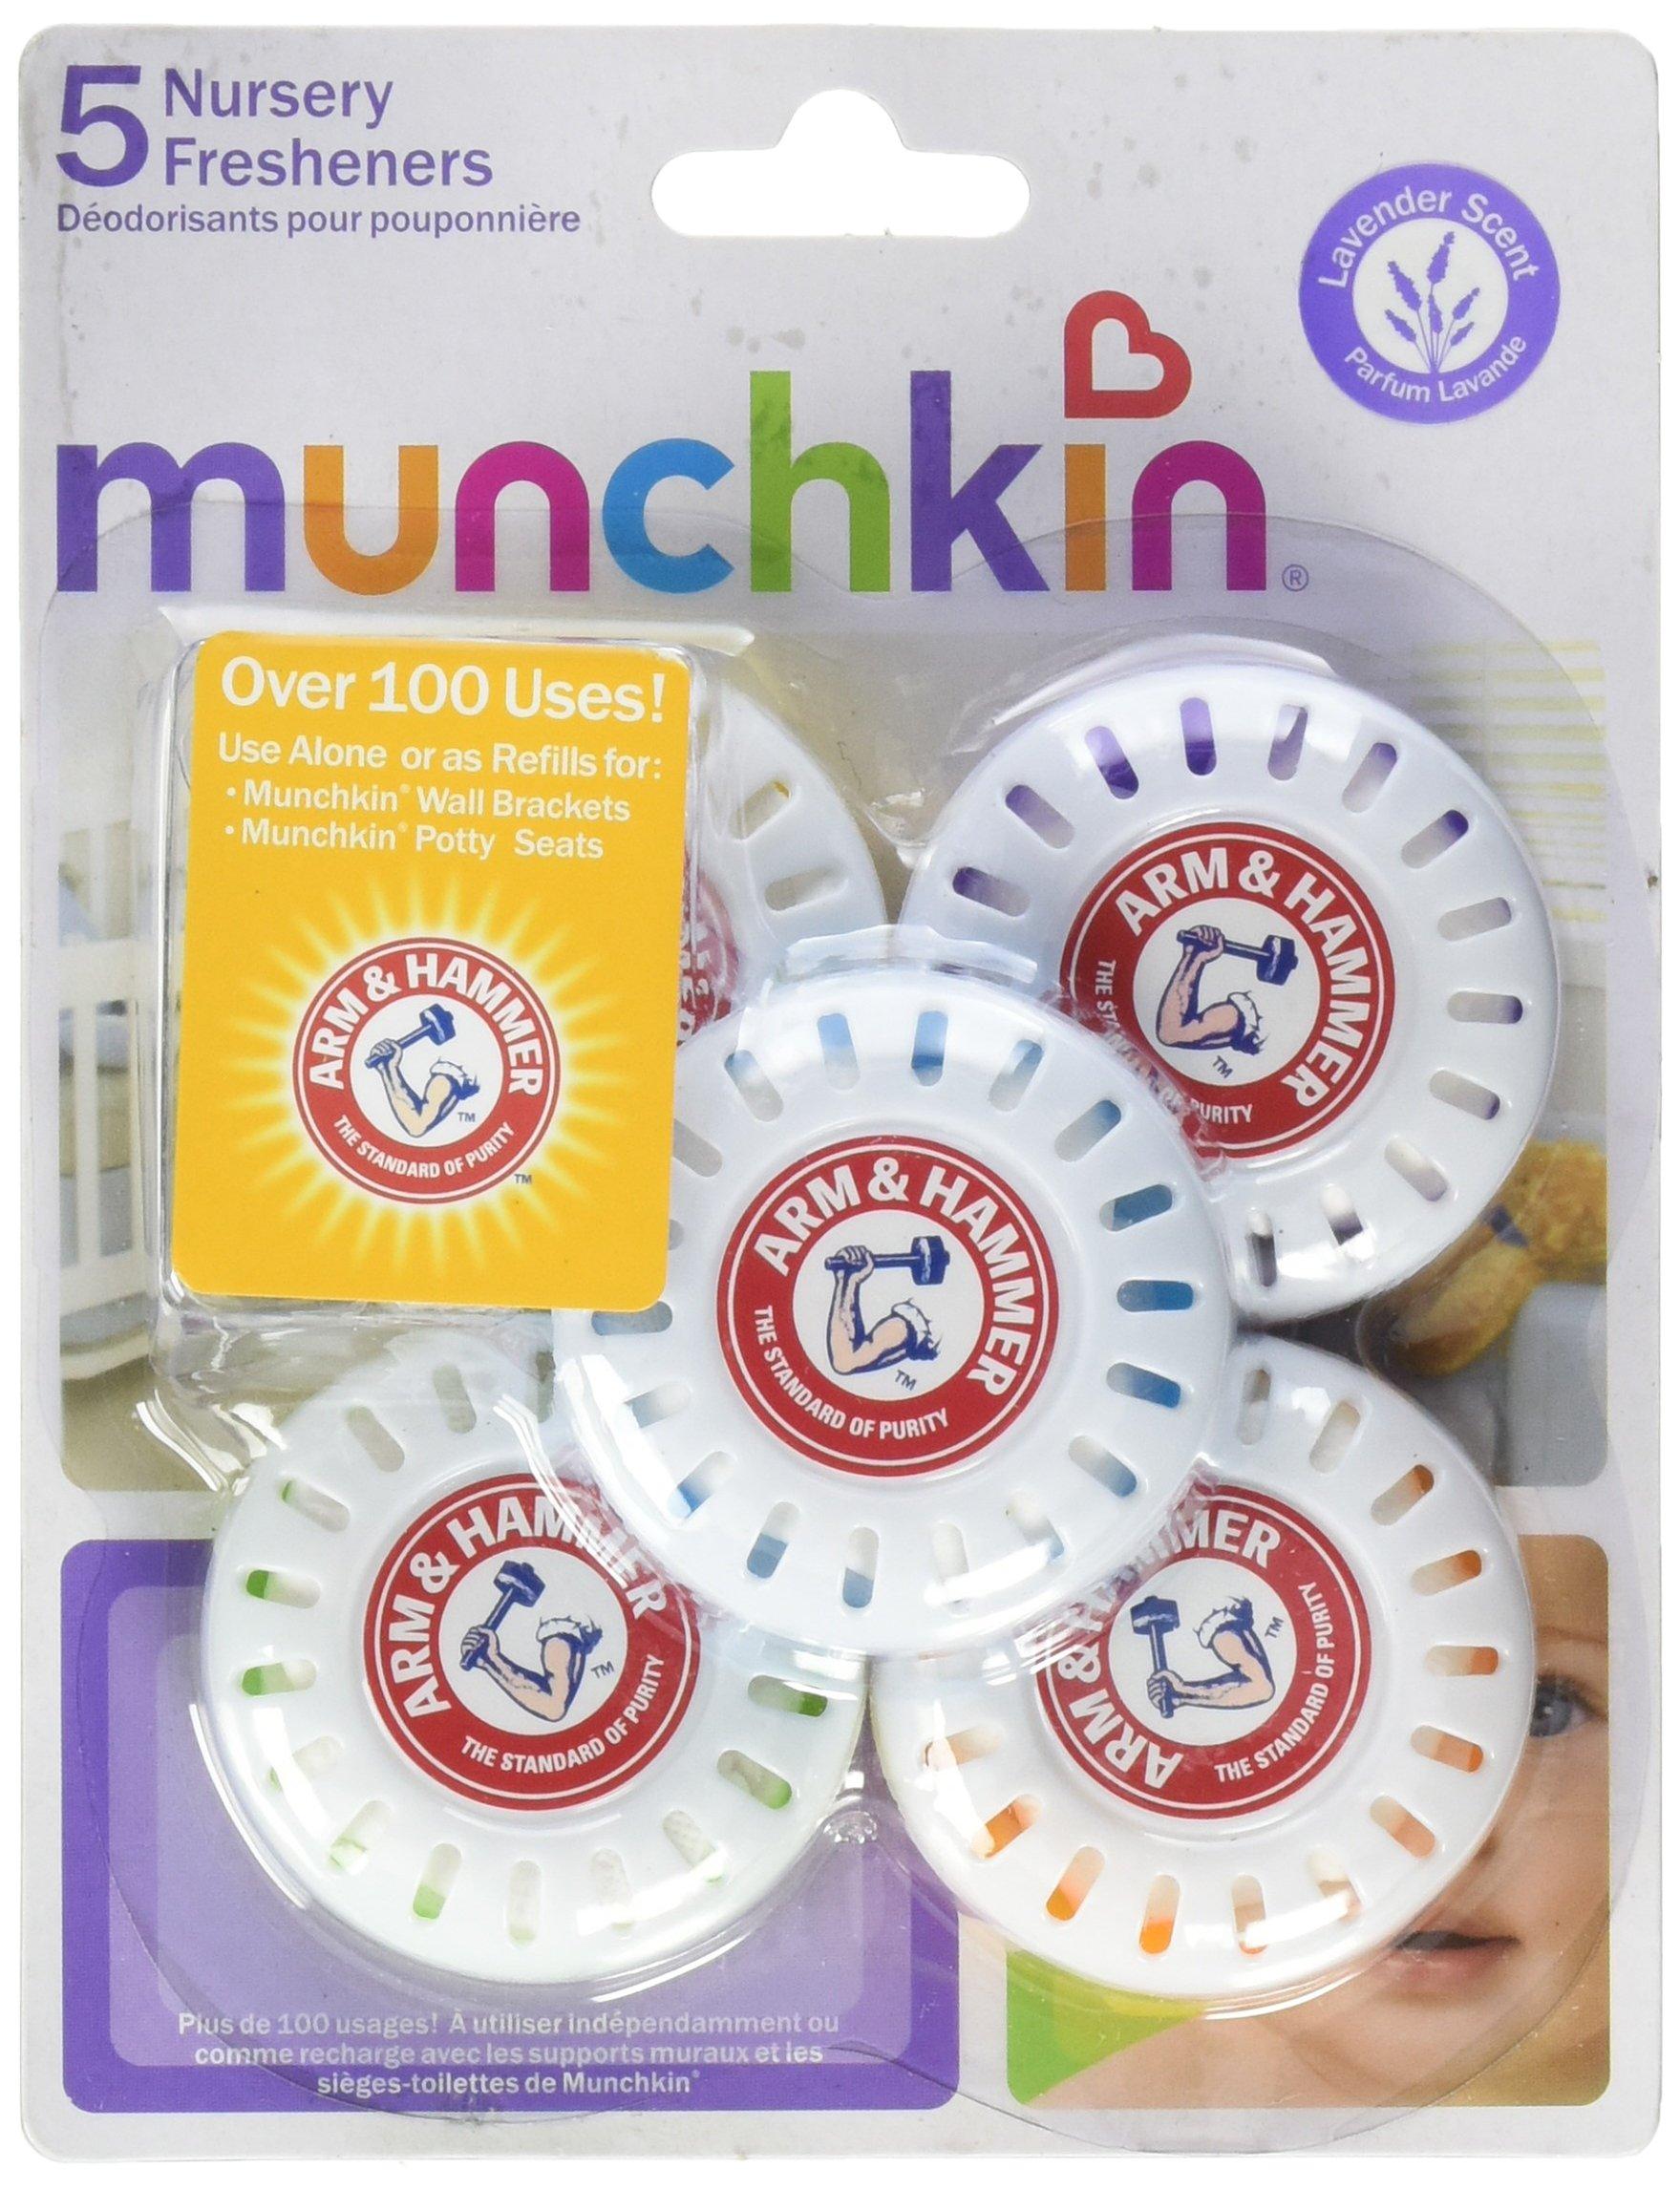 Munchkin Arm and Hammer Nursery Fresheners, Lavender/Citrus by Munchkin